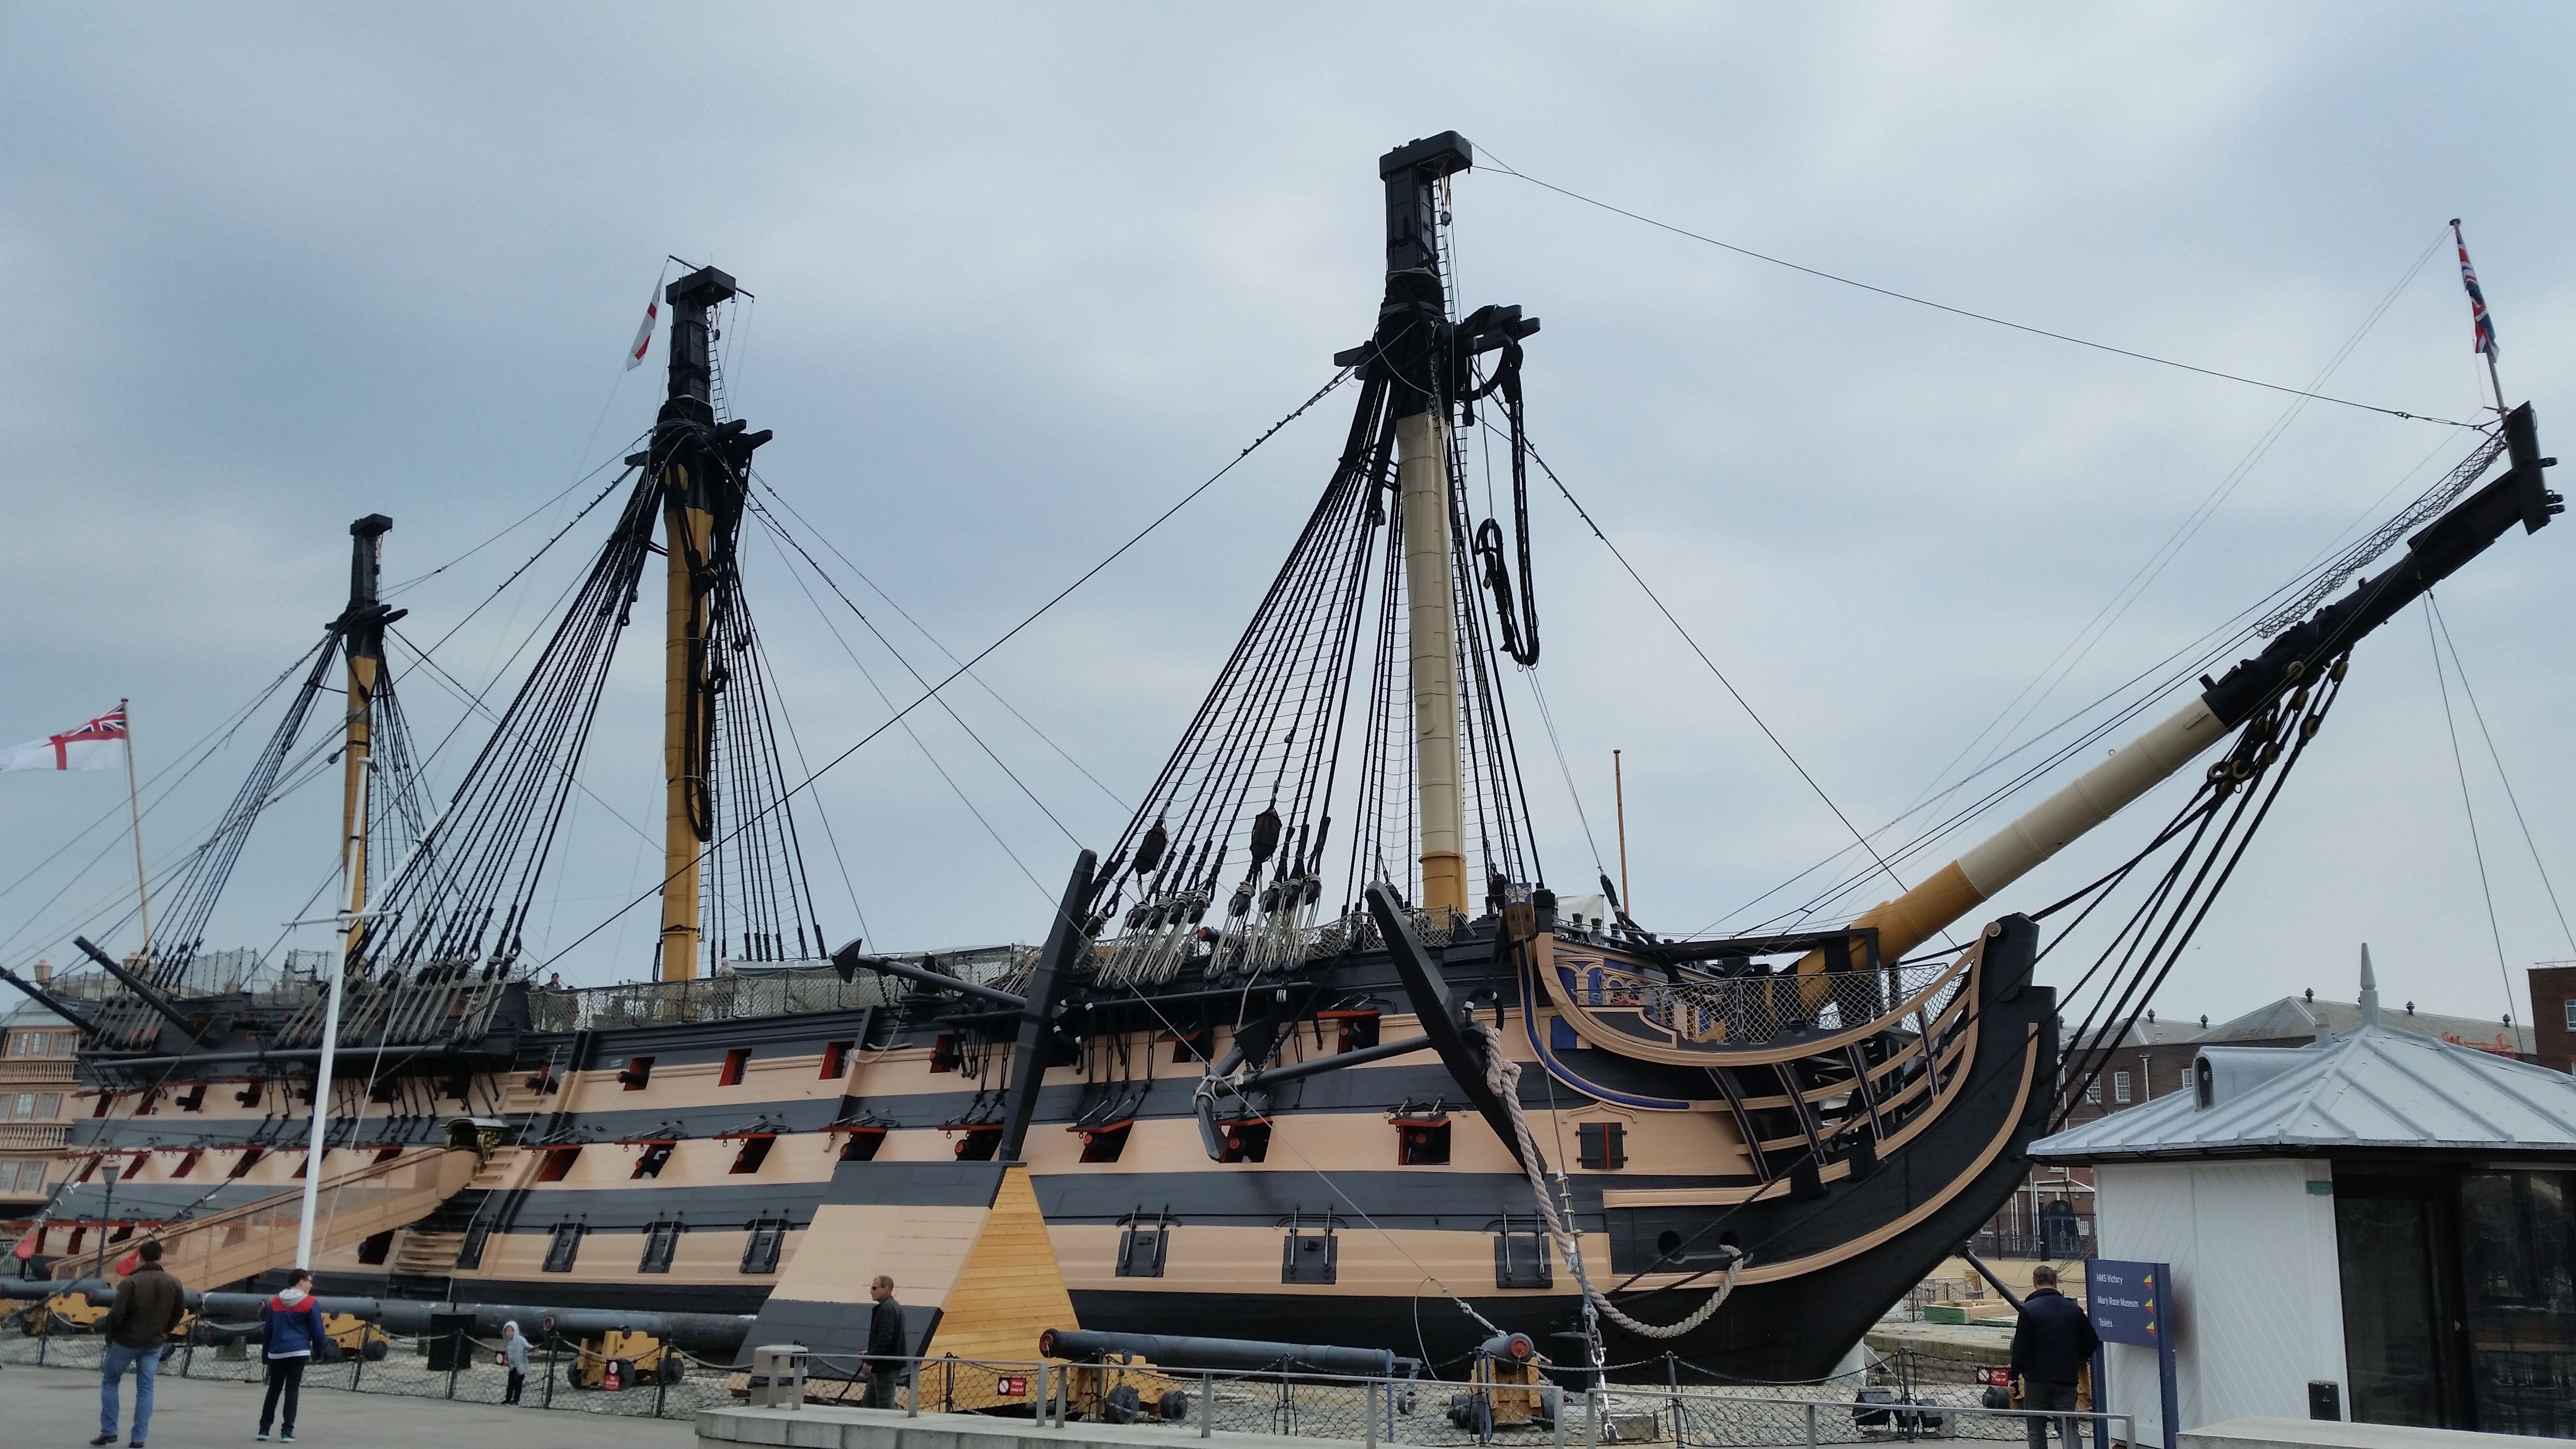 Marcus Bernhardsson, Engelska flottan besöker Hanö